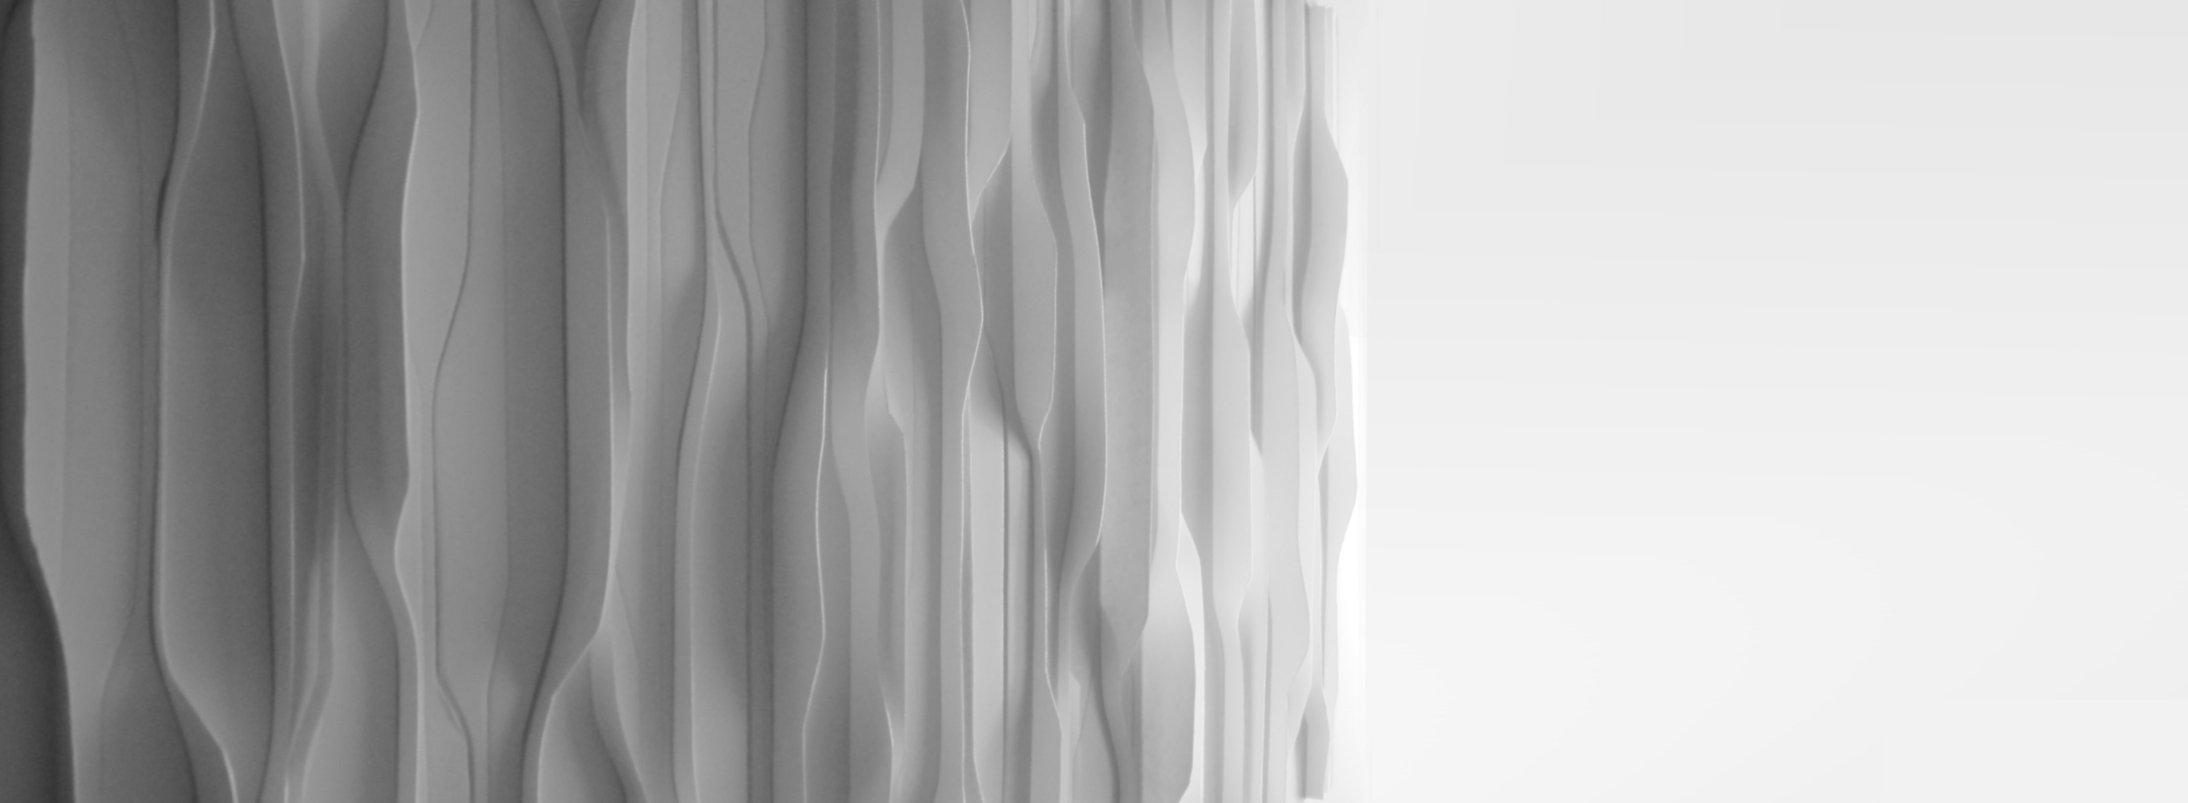 BOON Design_mural